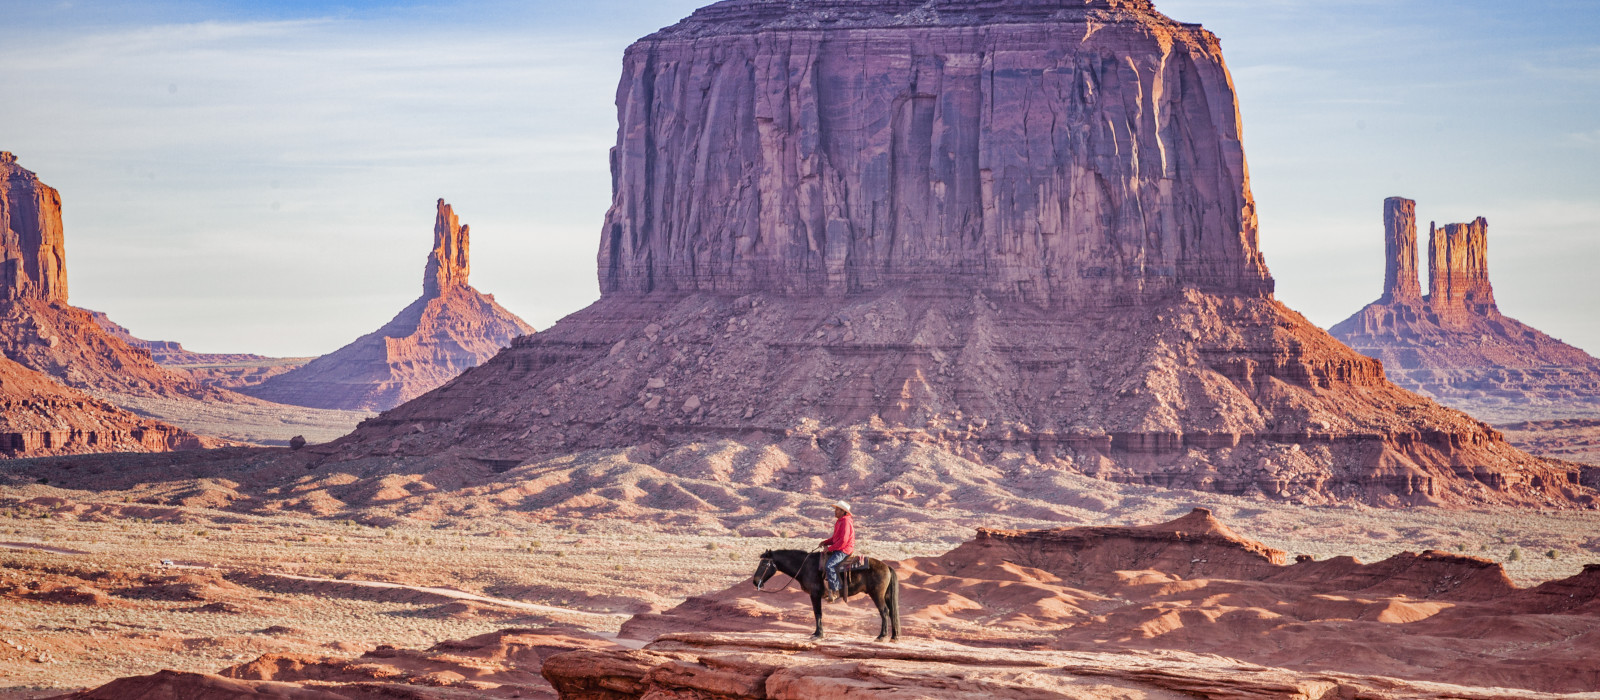 Reiseziel Monument Valley Navajo Tribal Park USA